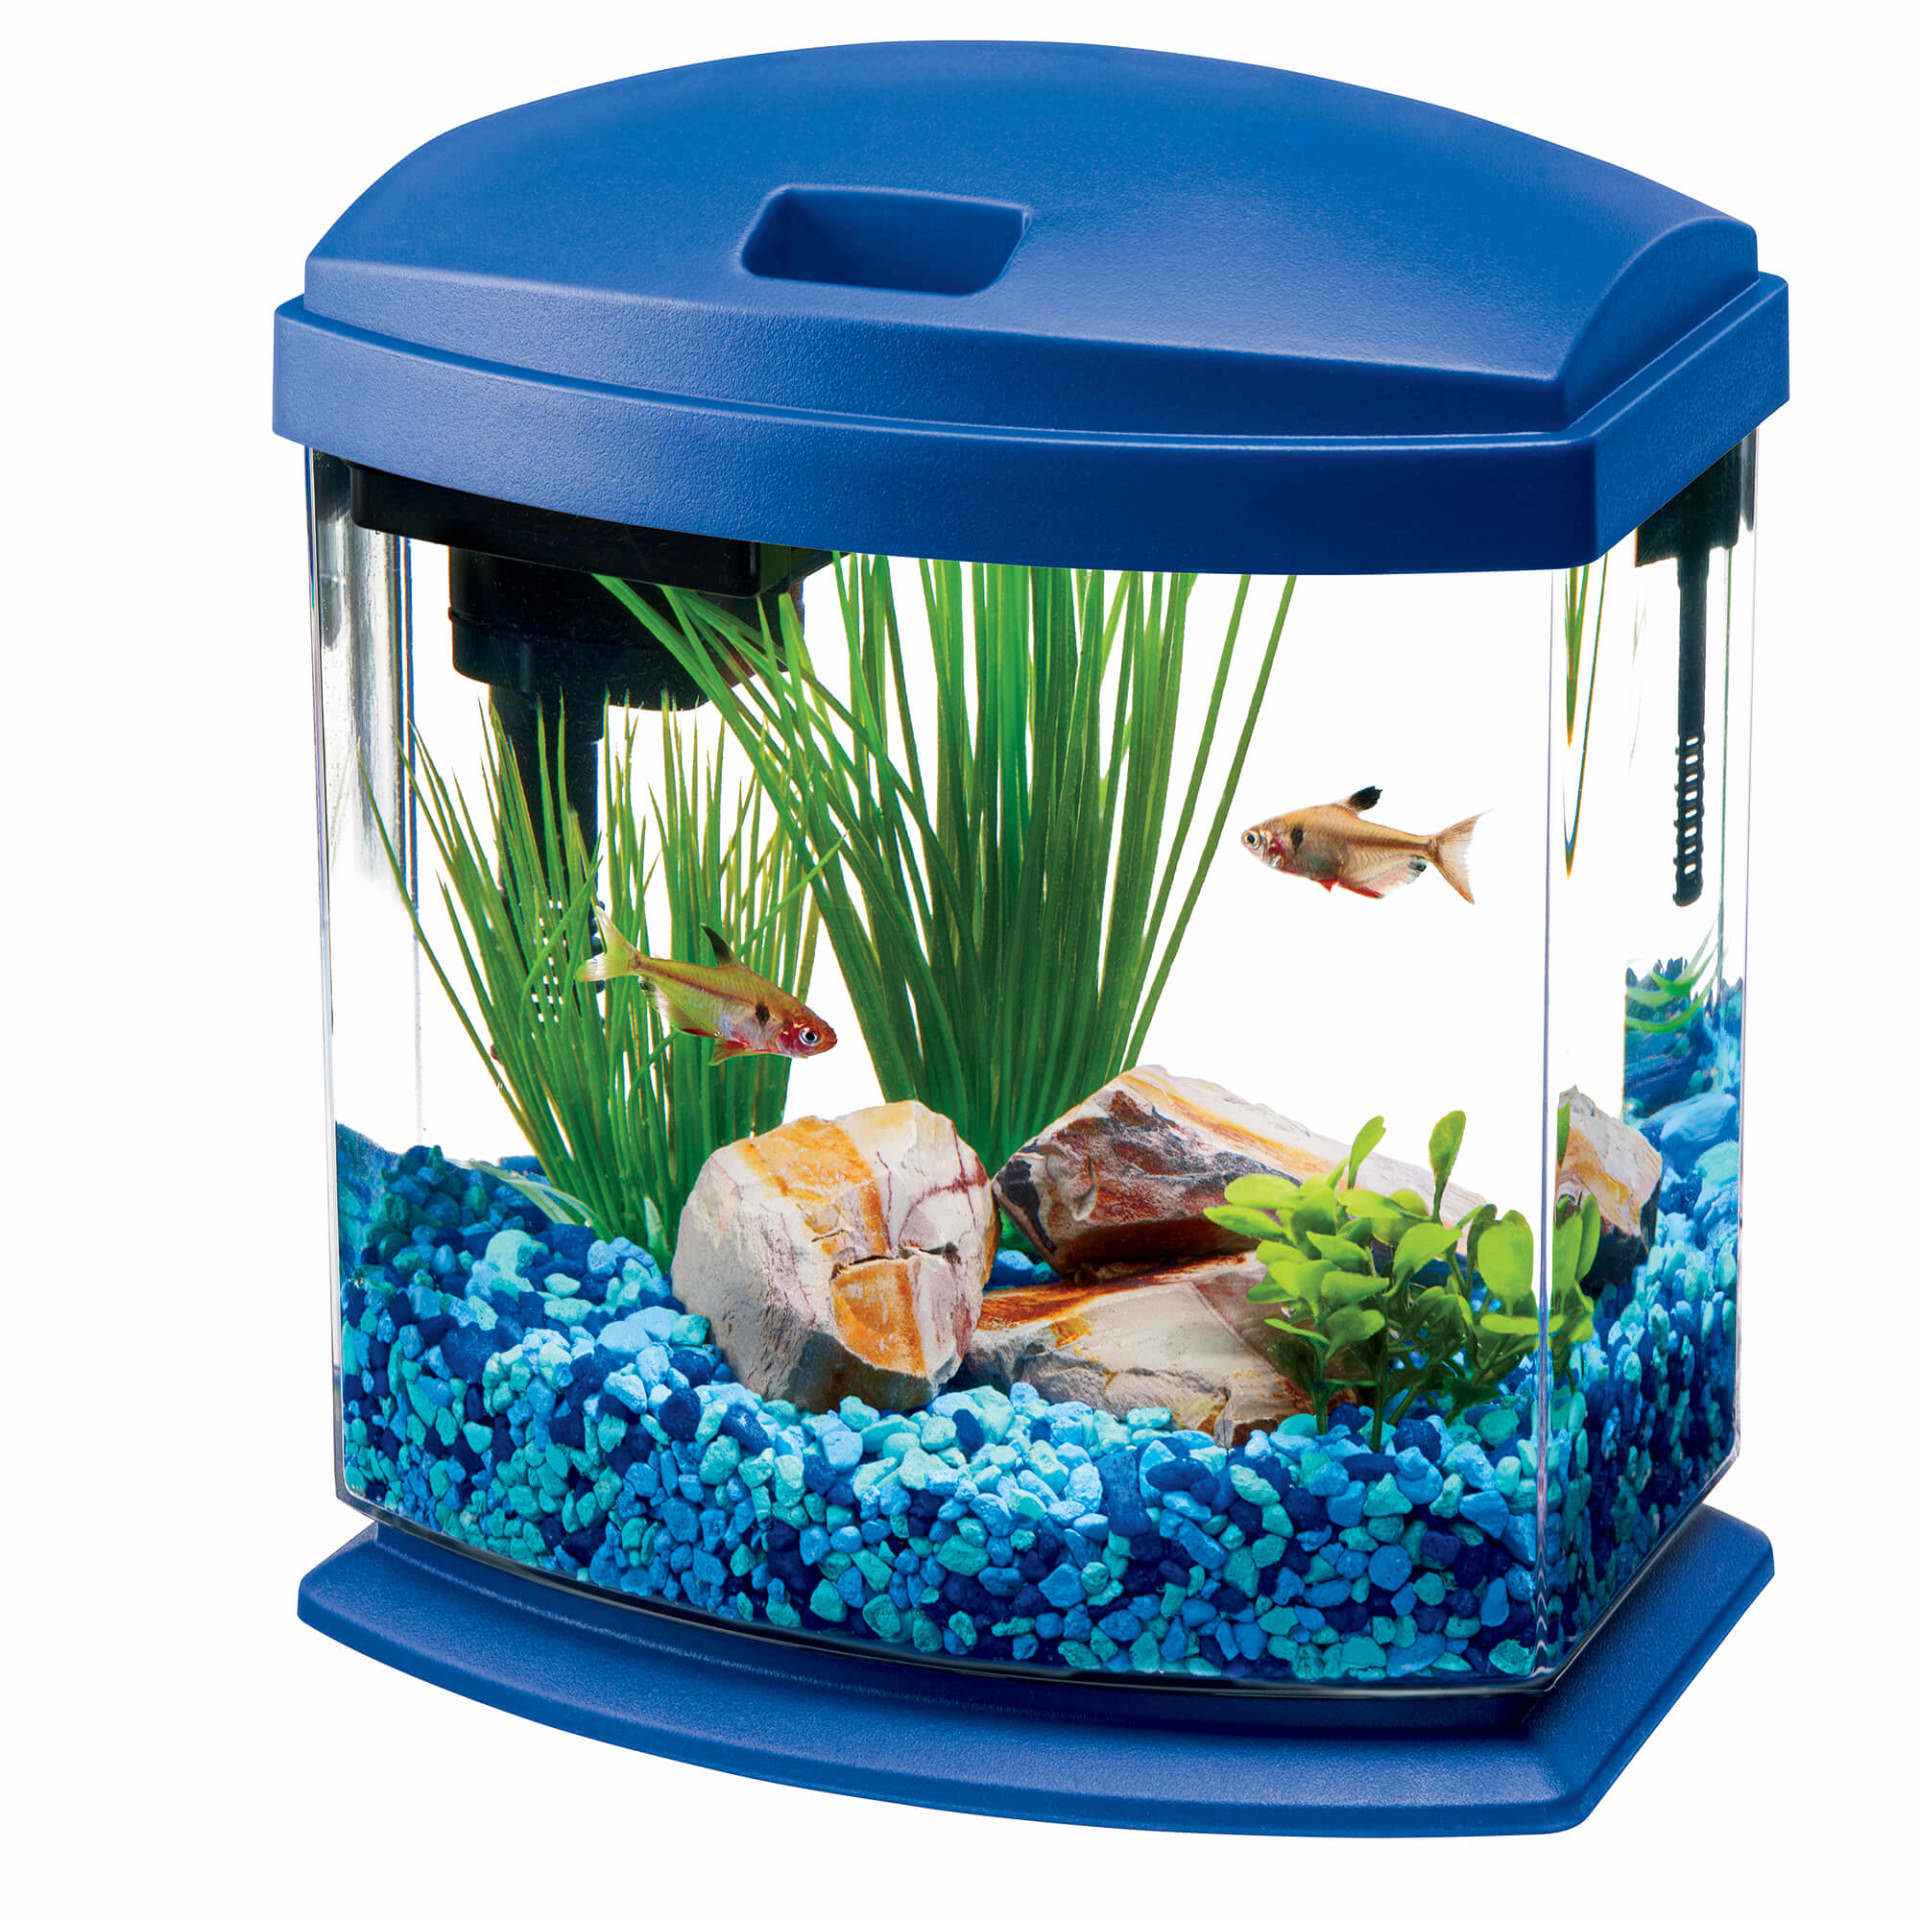 Aqueon MiniBow Aquarium LED Starter Kit, 1 Gallon, Blue